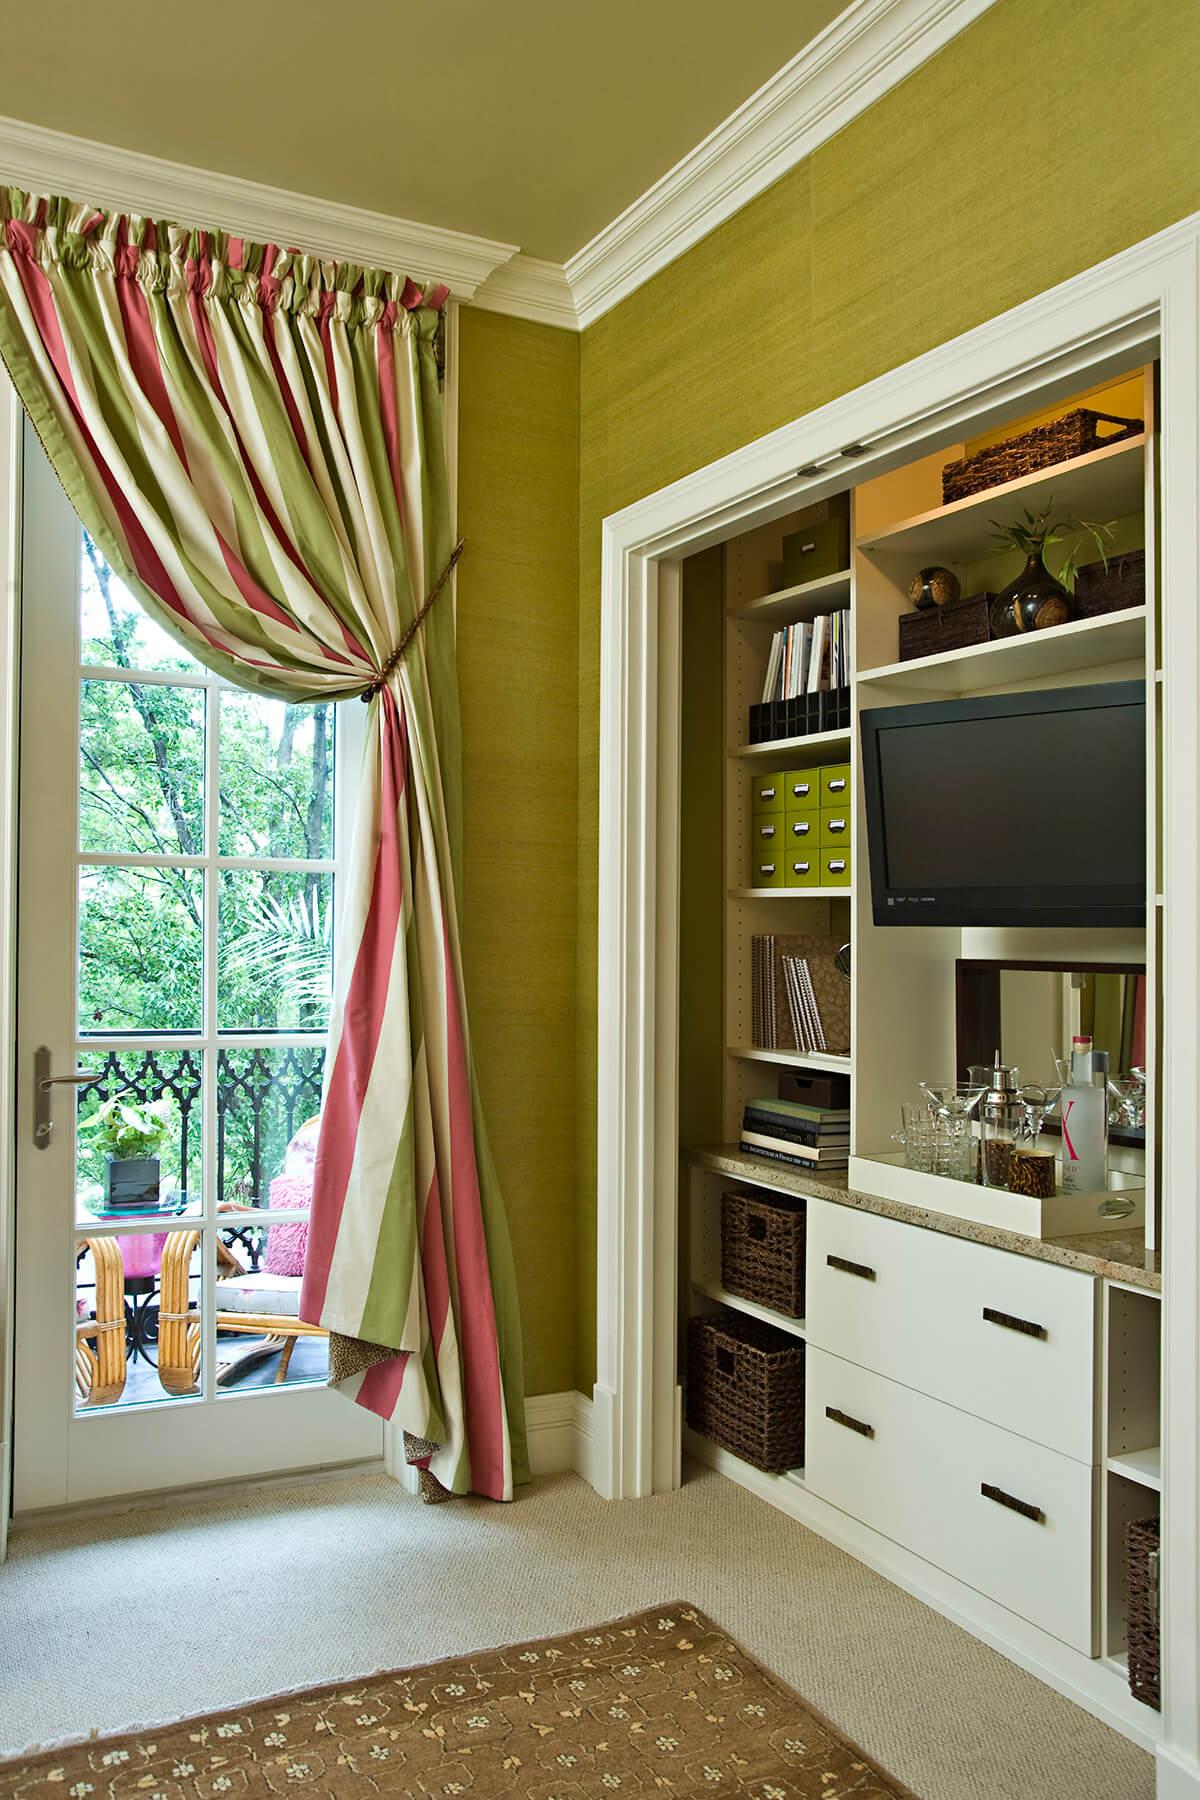 Enjoyable 26 Home Office Designs Desks Shelving By Closet Factory Largest Home Design Picture Inspirations Pitcheantrous